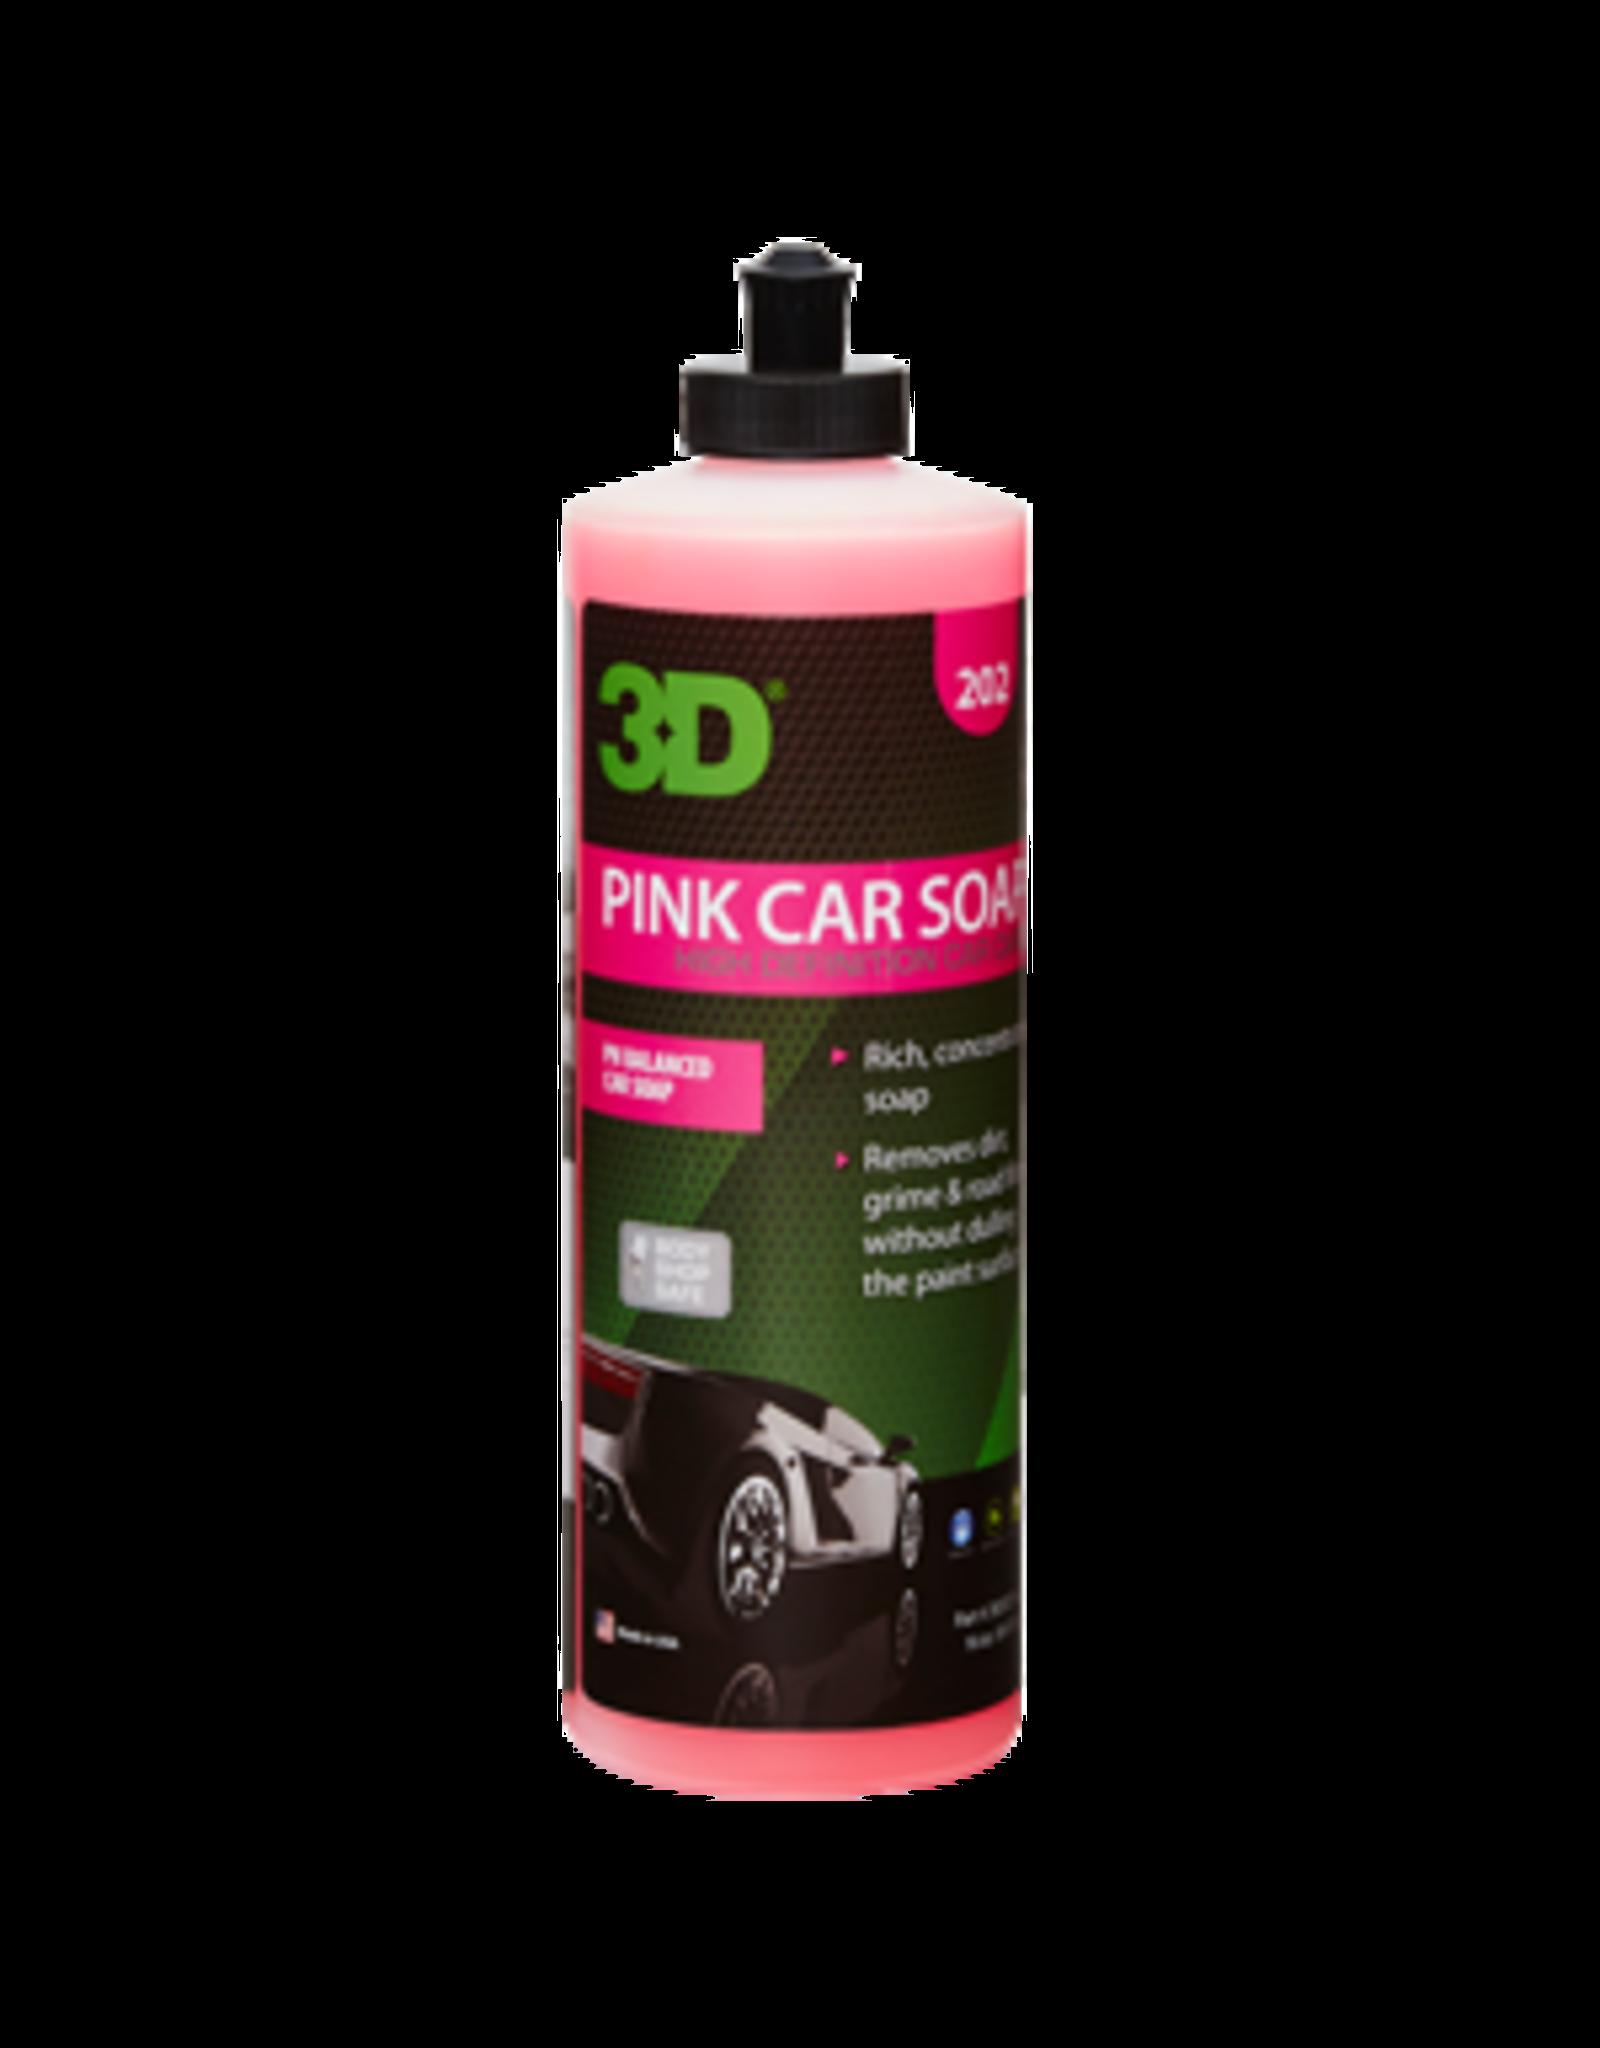 3D PRODUCTS 3D Pink Car Soap - 16 oz / 473 ml Flacon